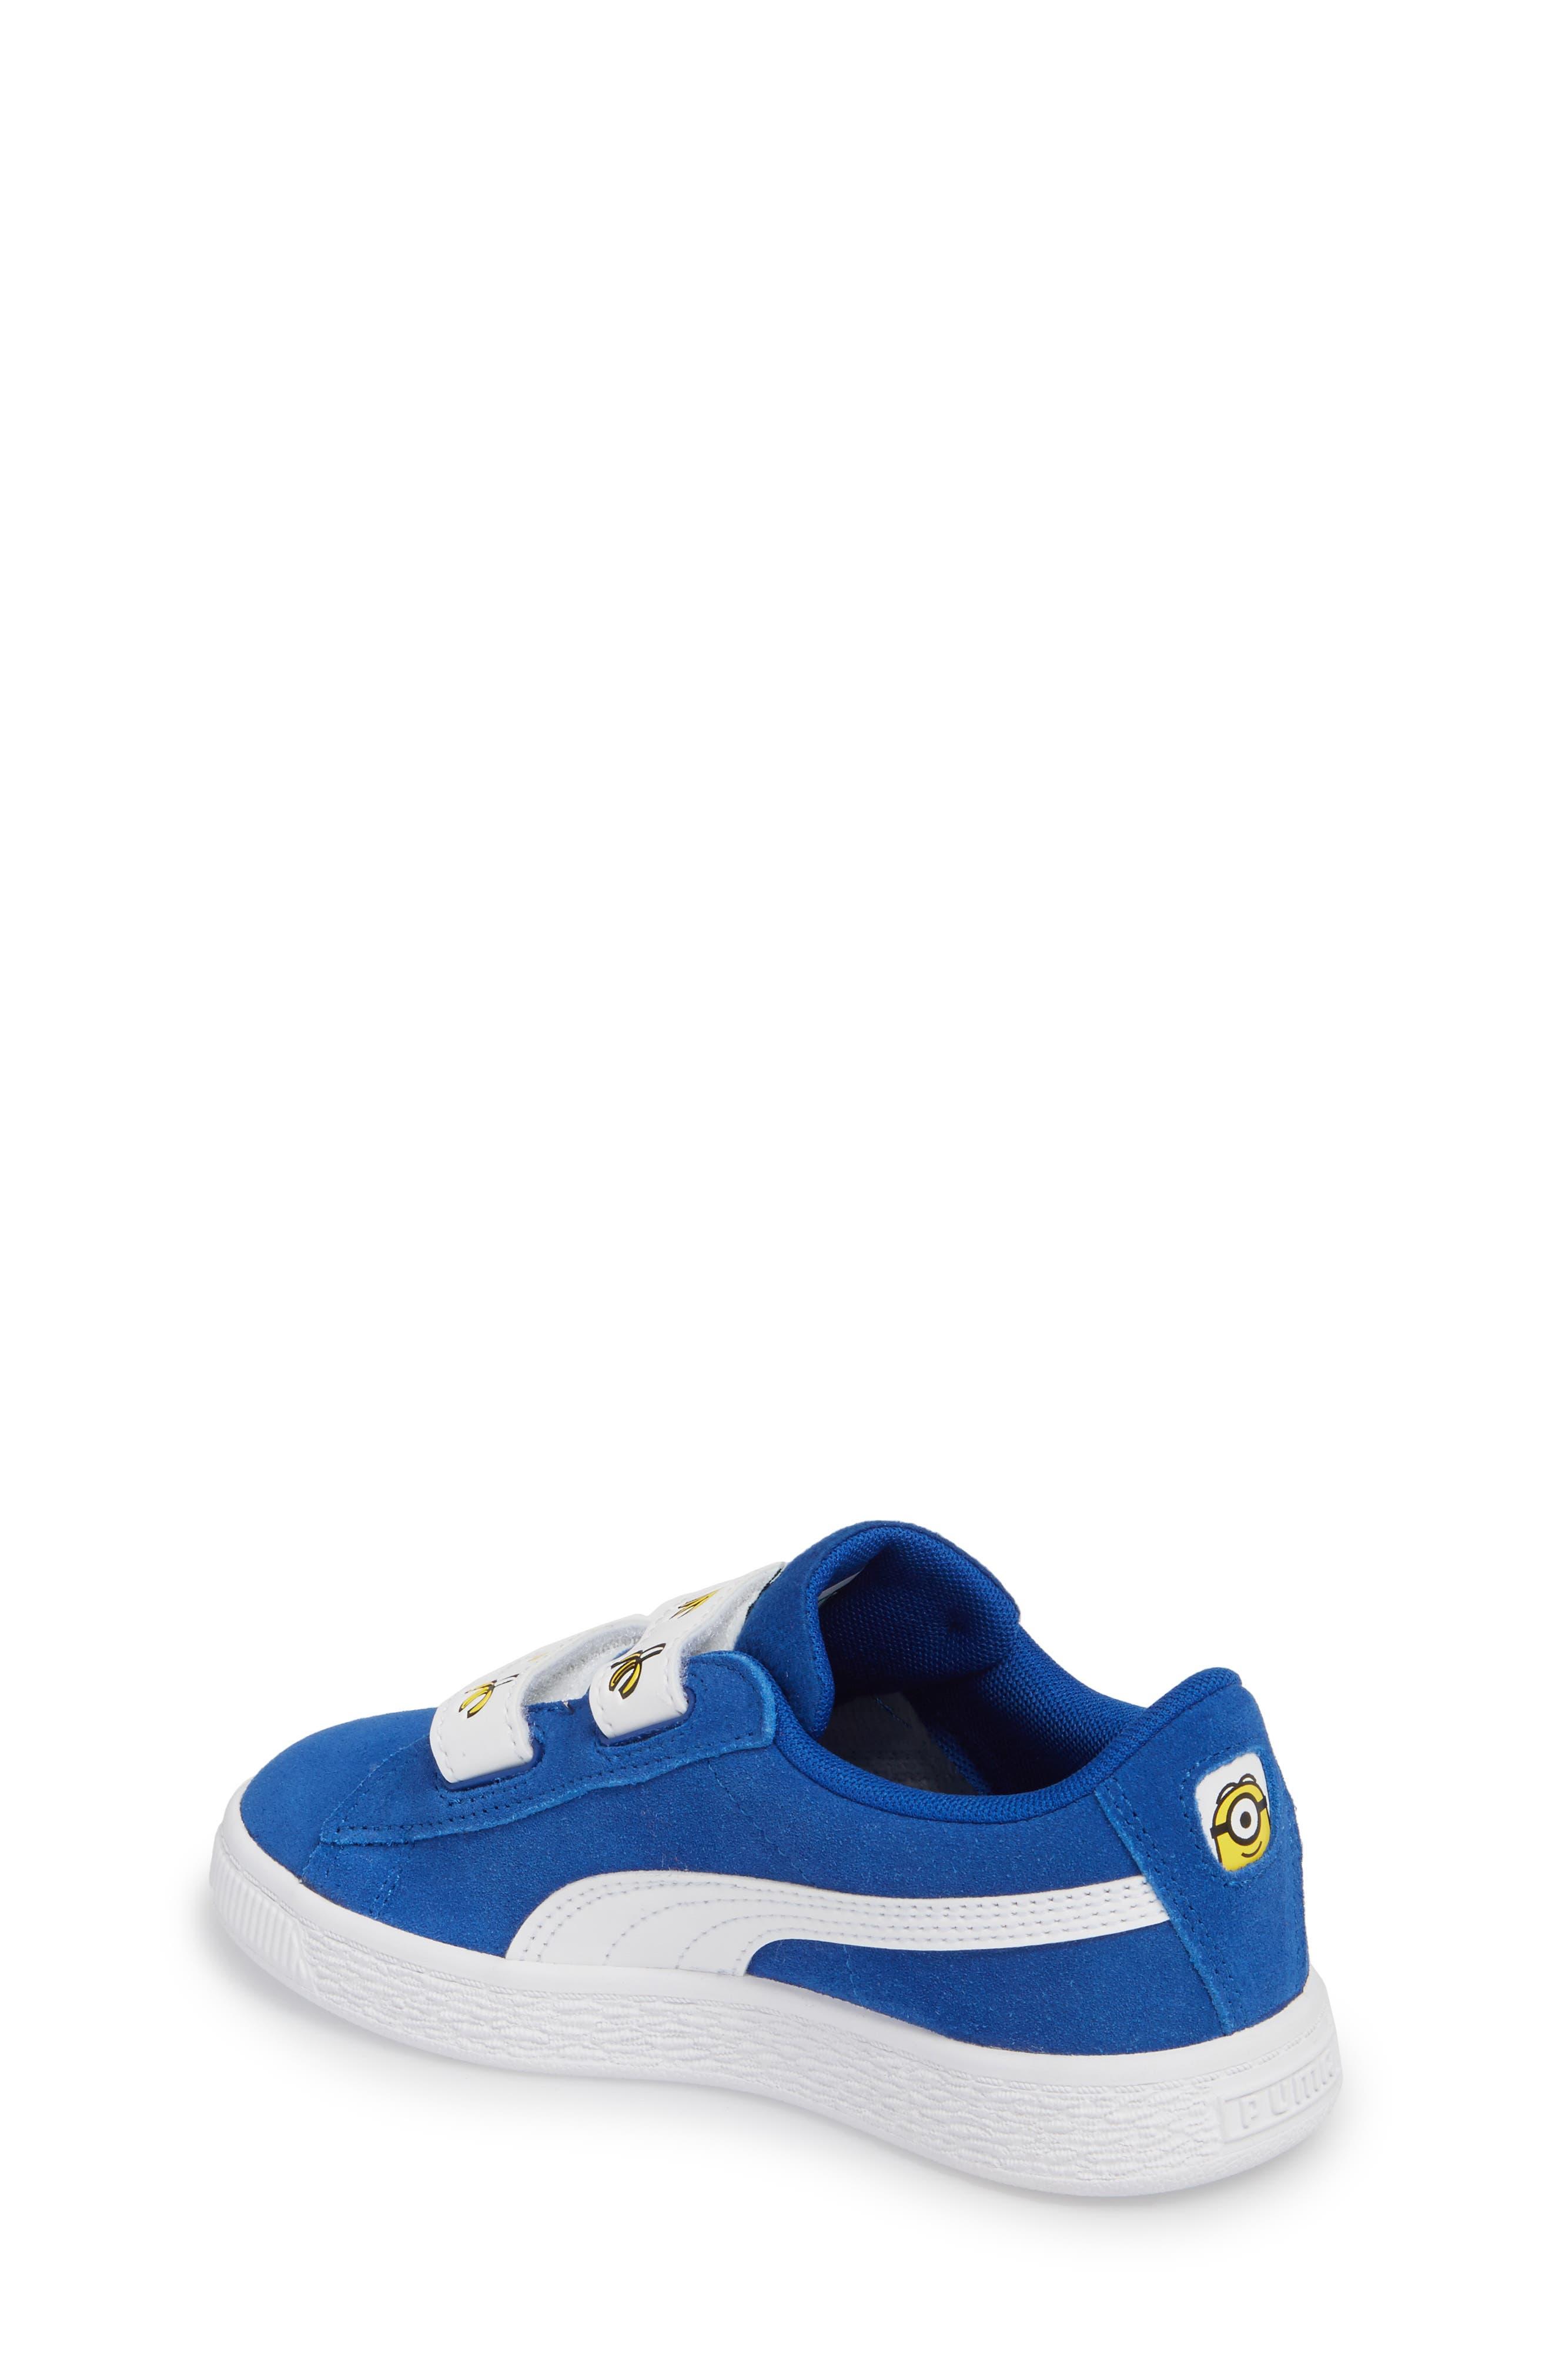 x Minions Suede V Sneaker,                             Alternate thumbnail 2, color,                             Olympian Blue/ Puma White